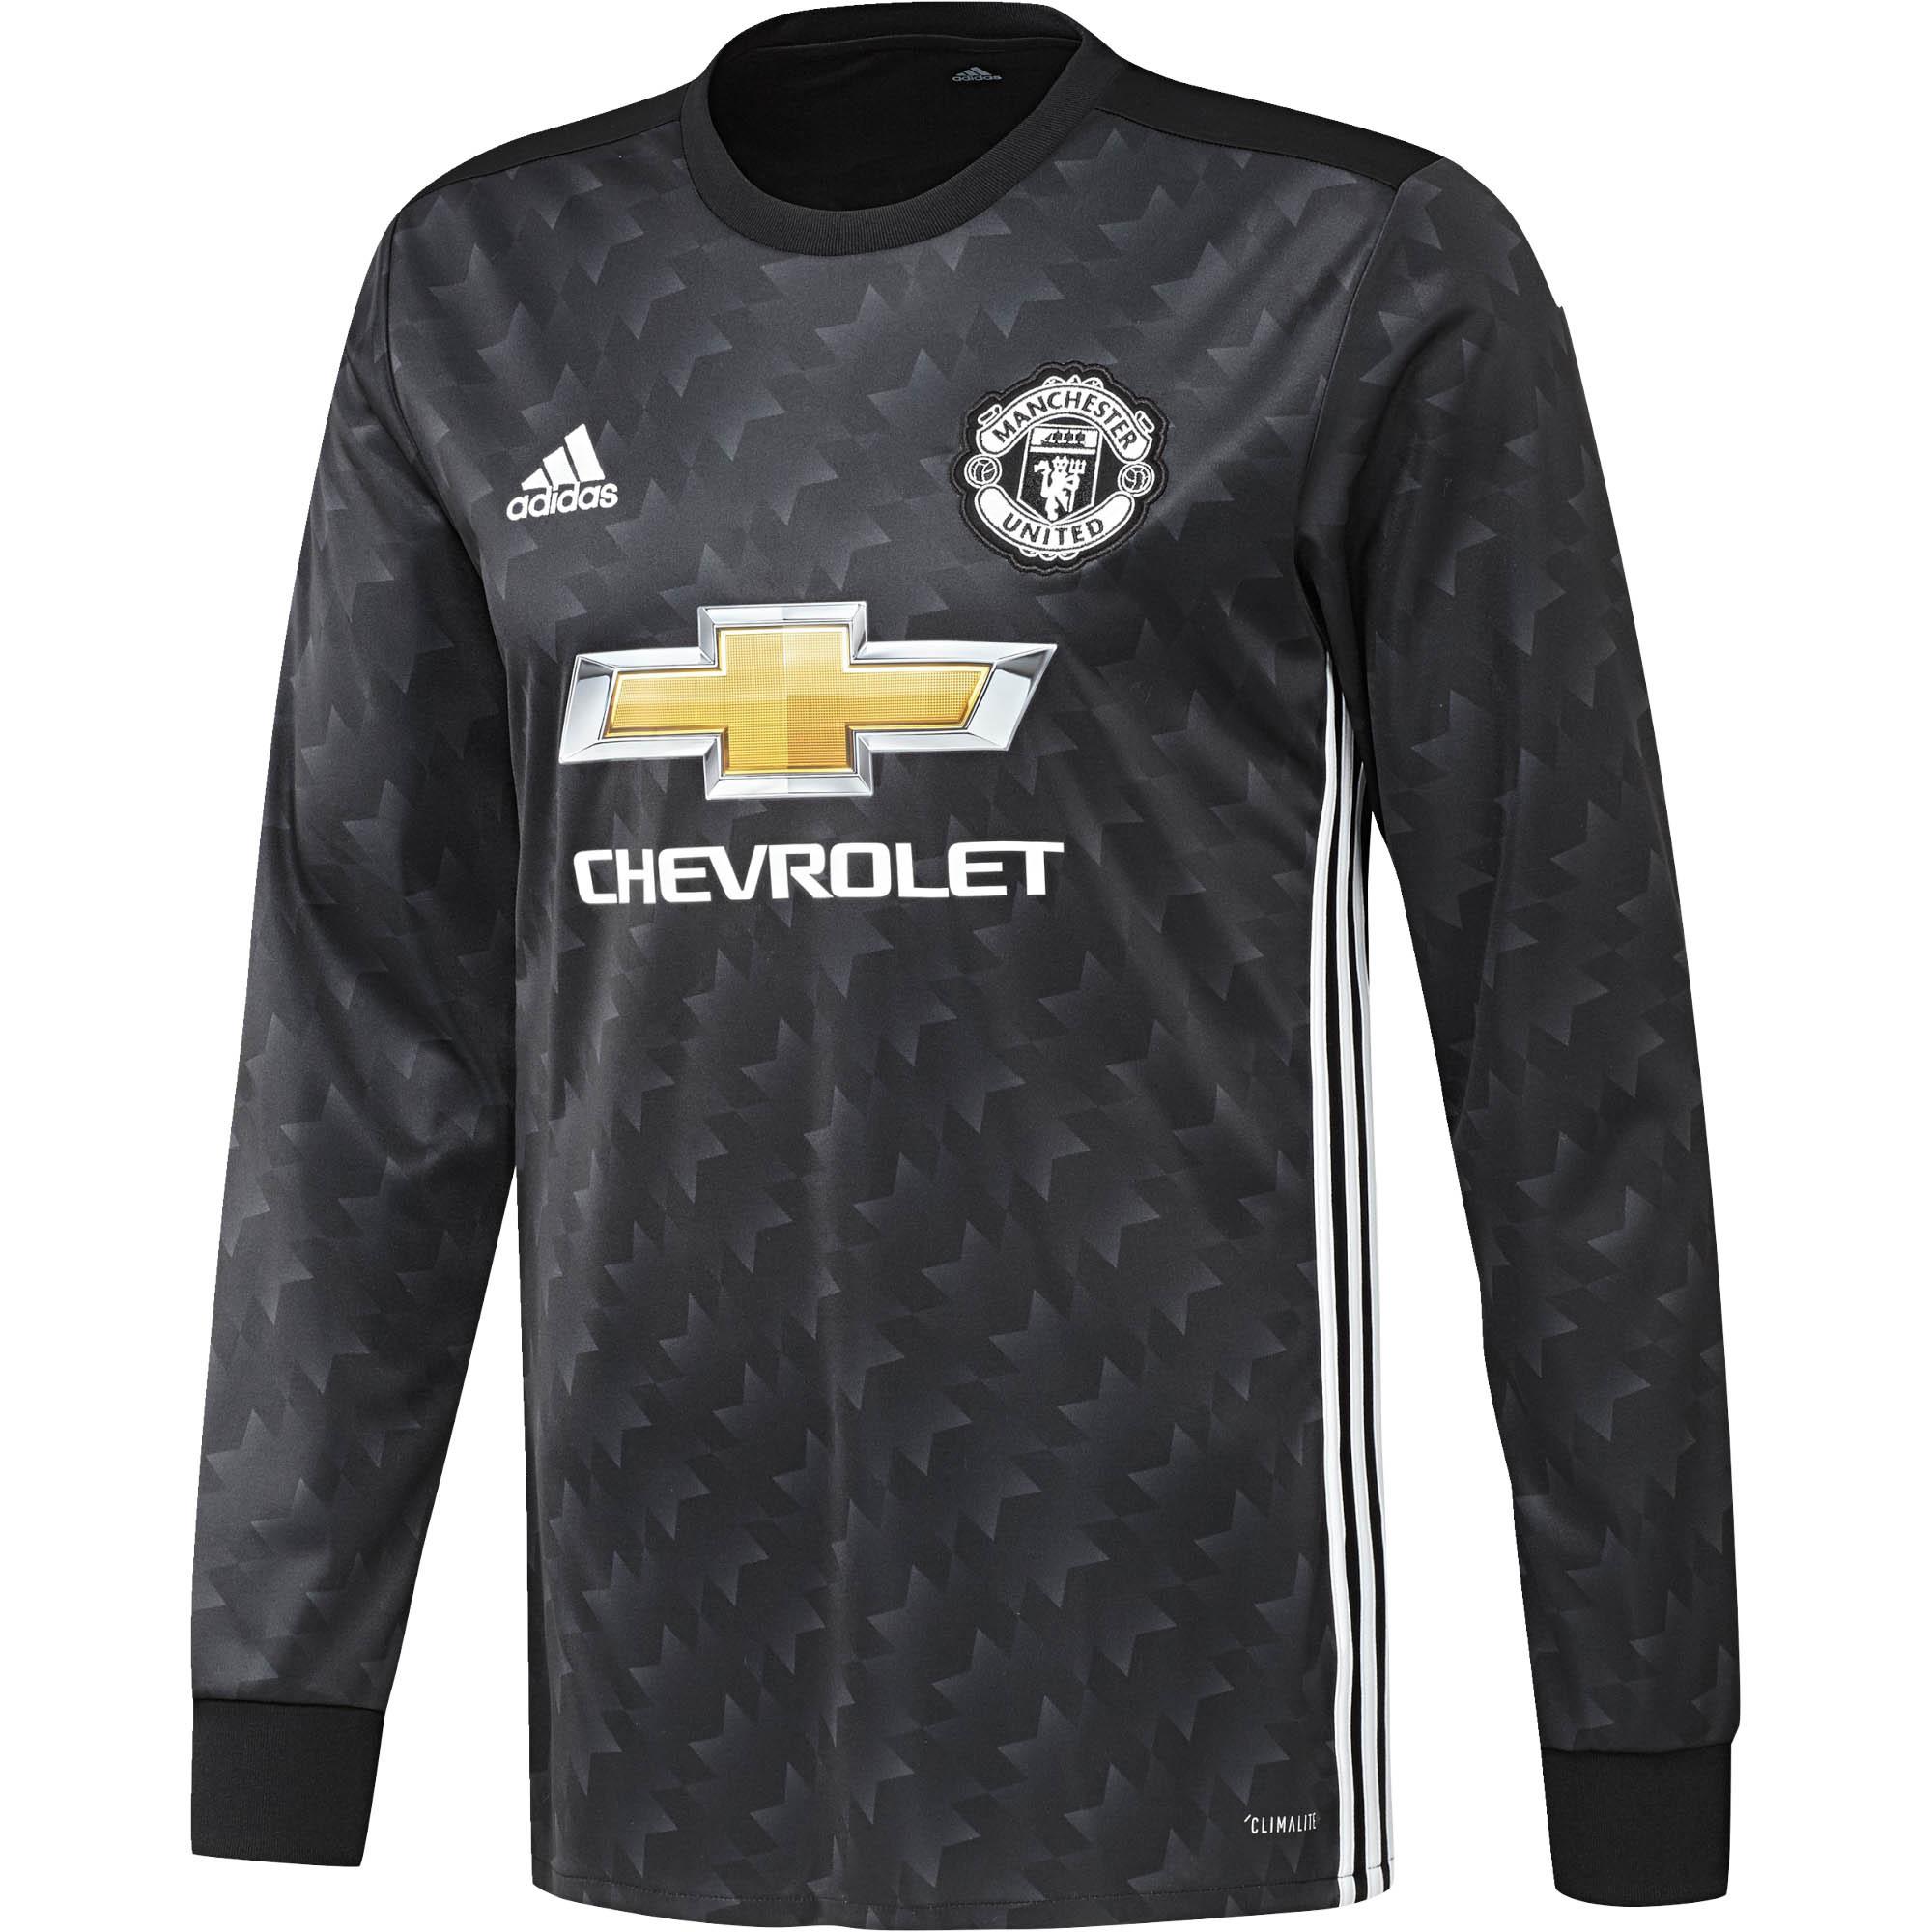 0399cecb4 2017 18 adidas Manchester United L S Away Jersey - SoccerPro.com